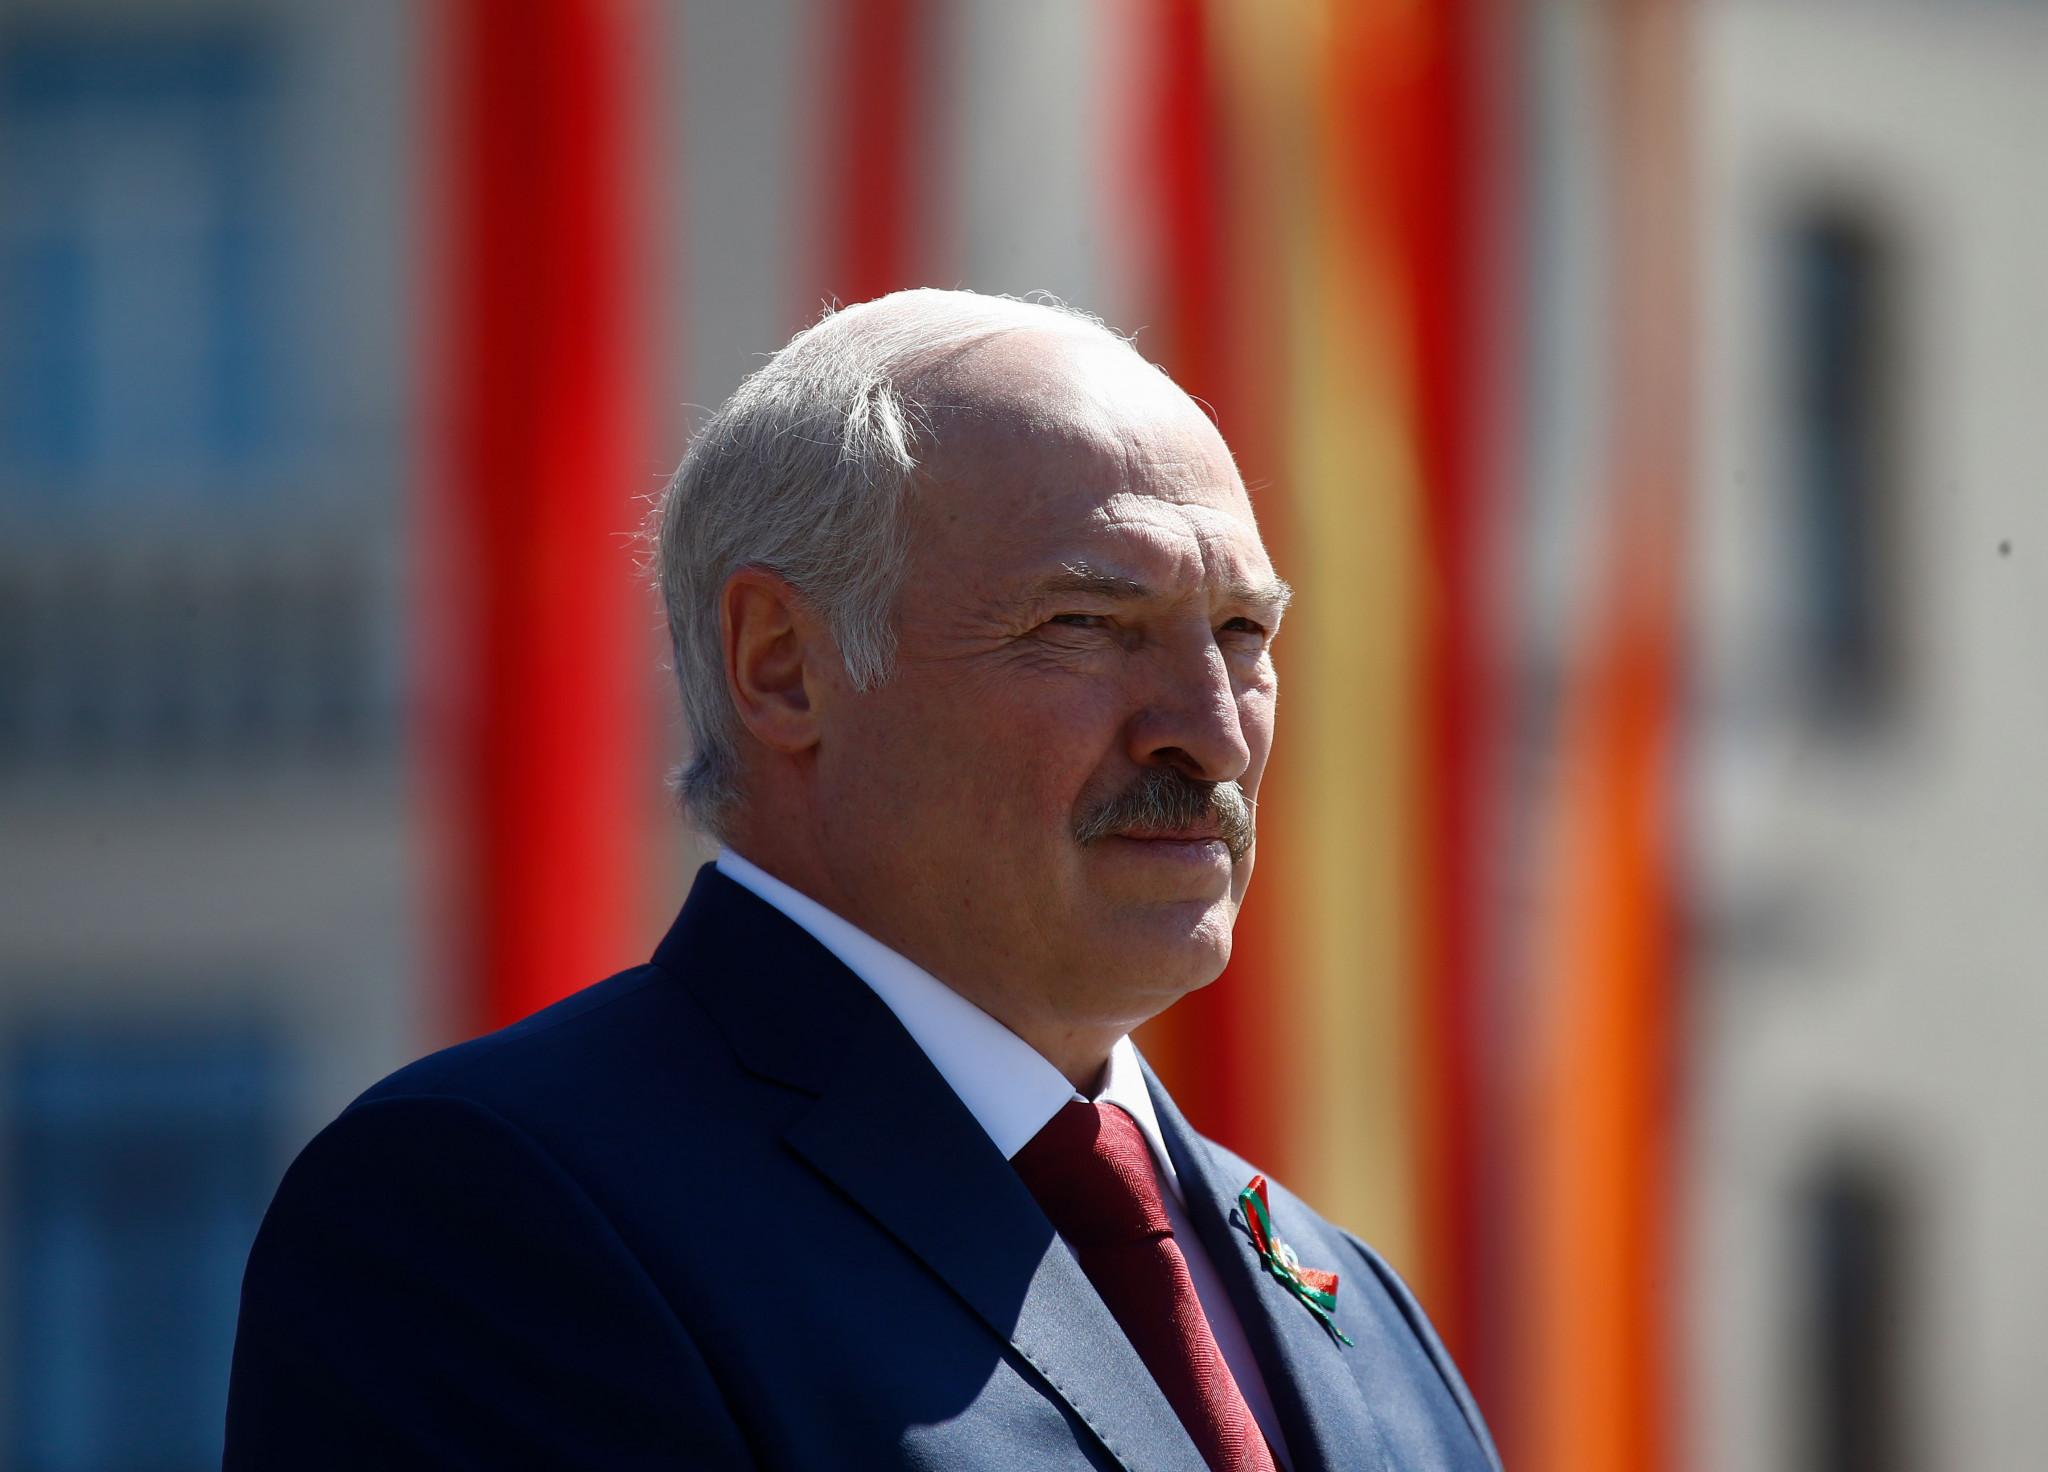 Alexander Lukashenko met with IAAF President Sebastian Coe ©Getty Images